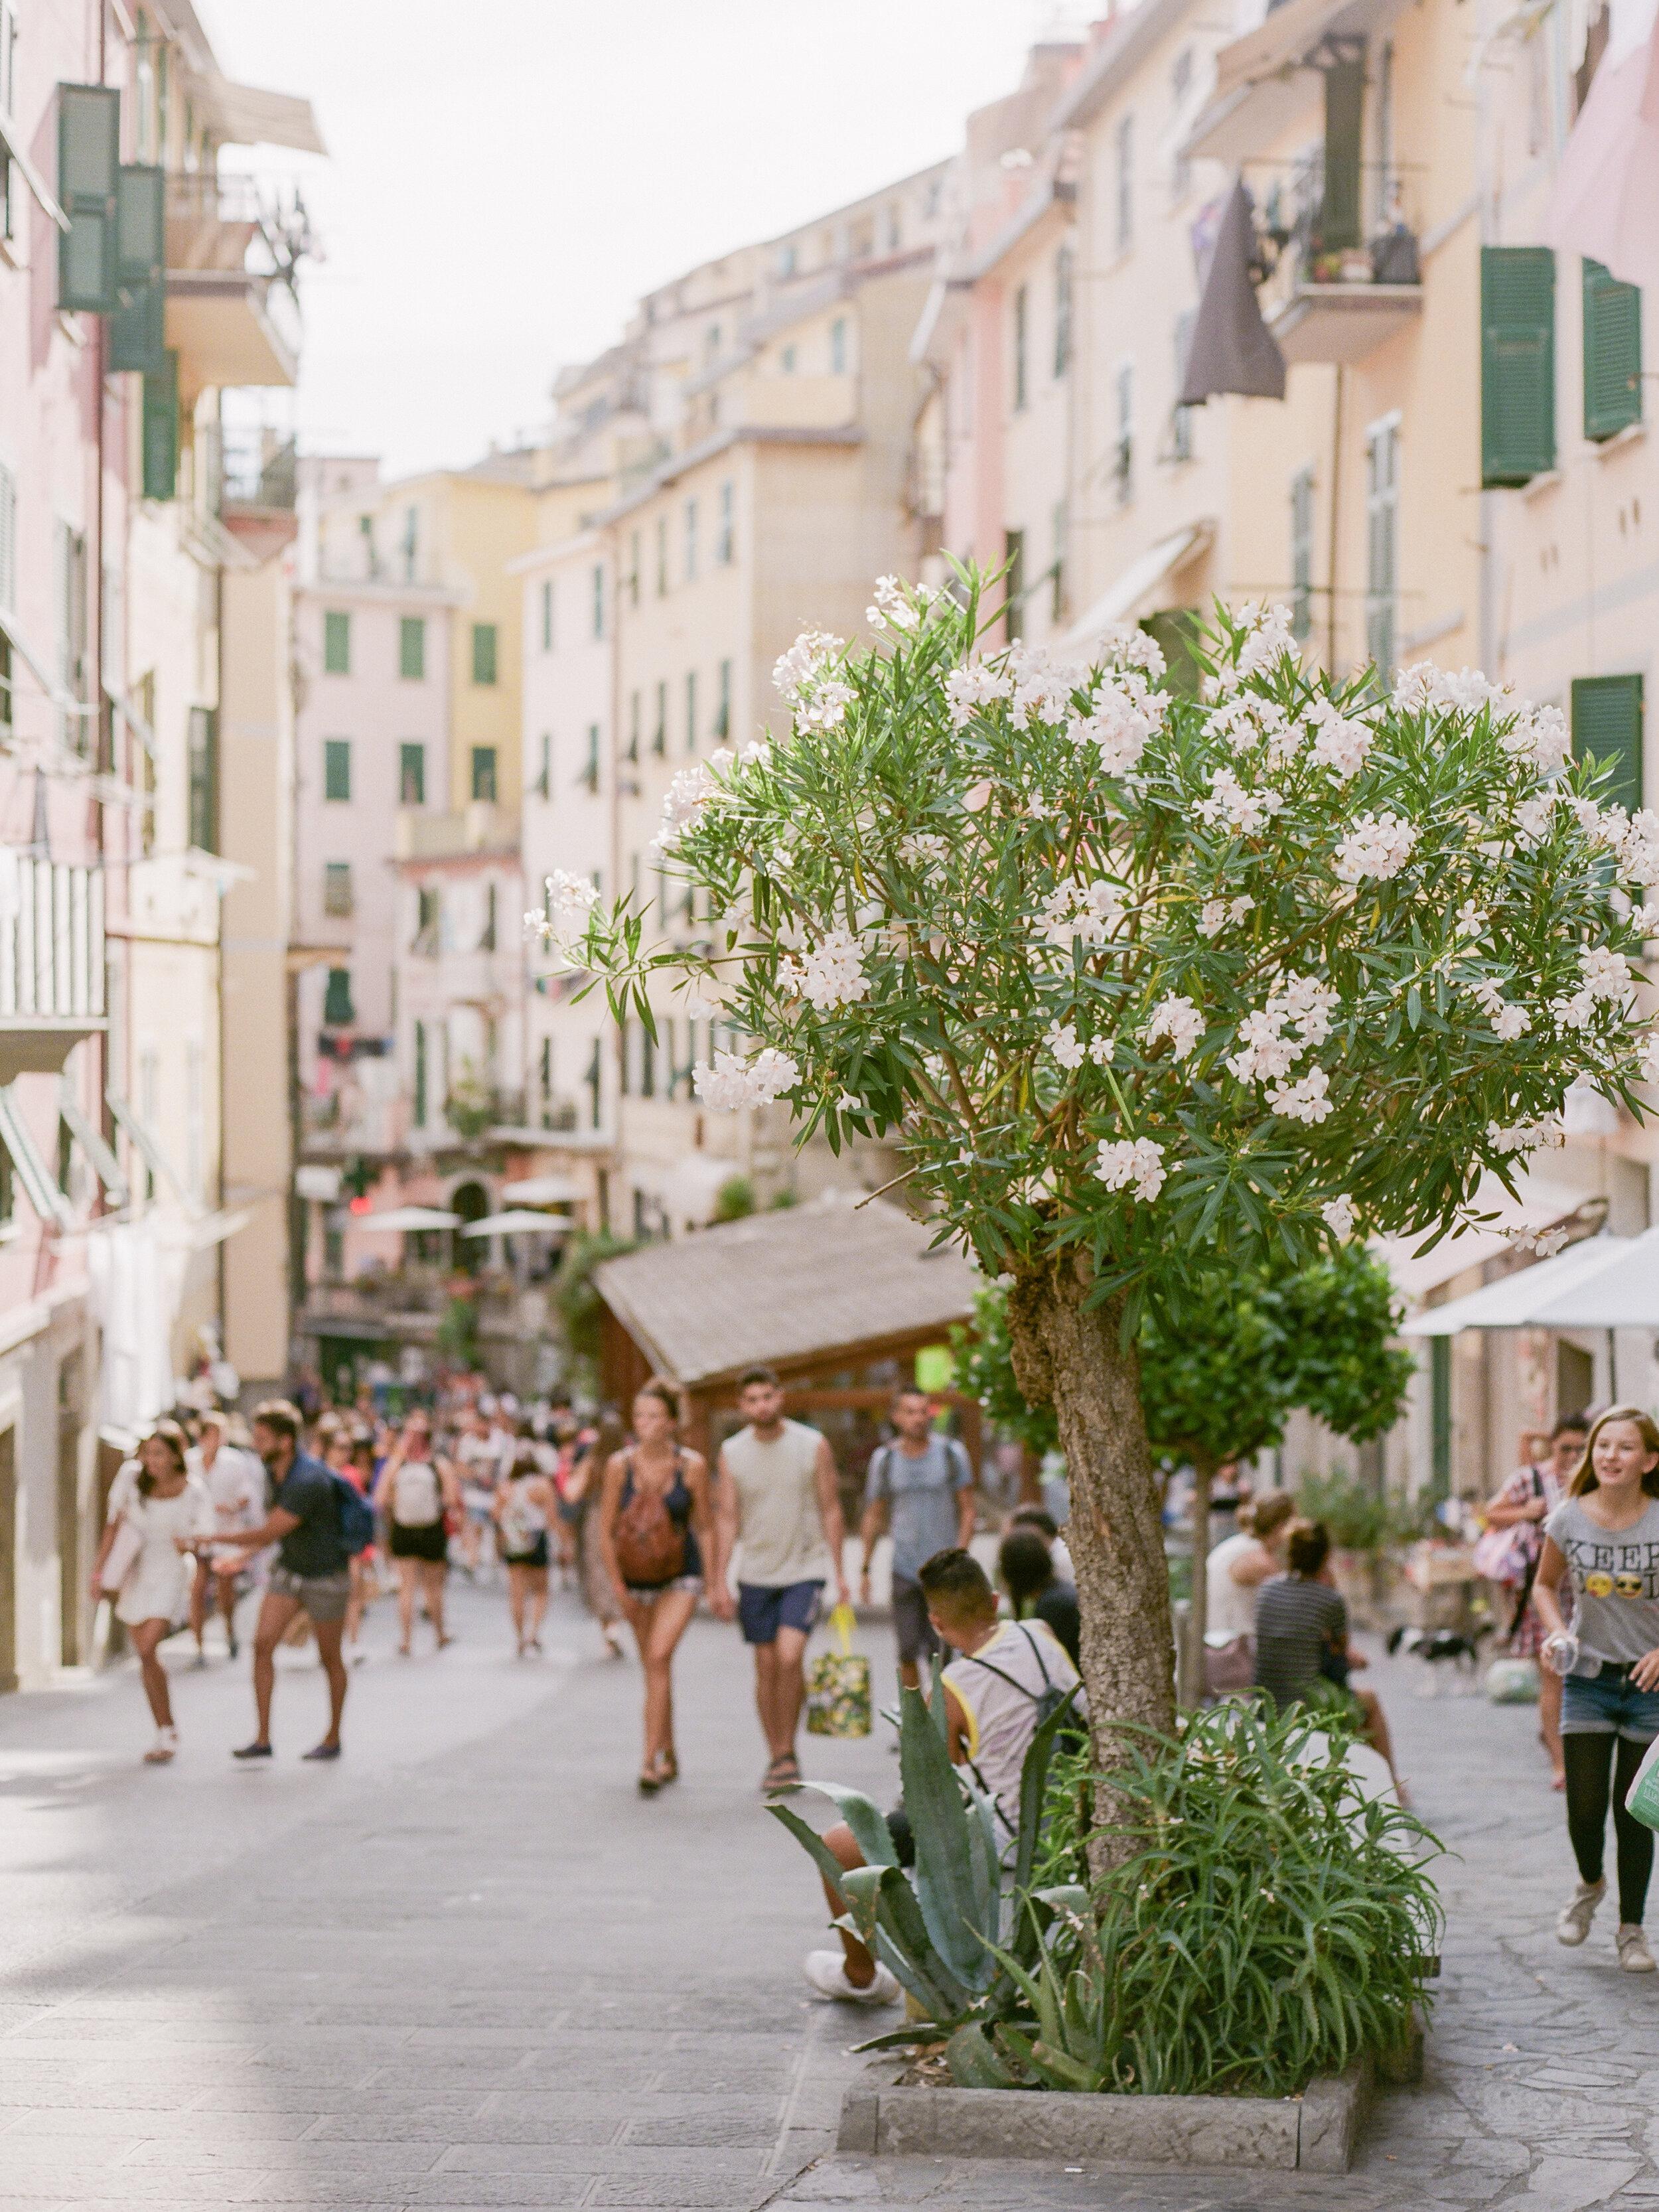 ItalyFilm_45.jpg